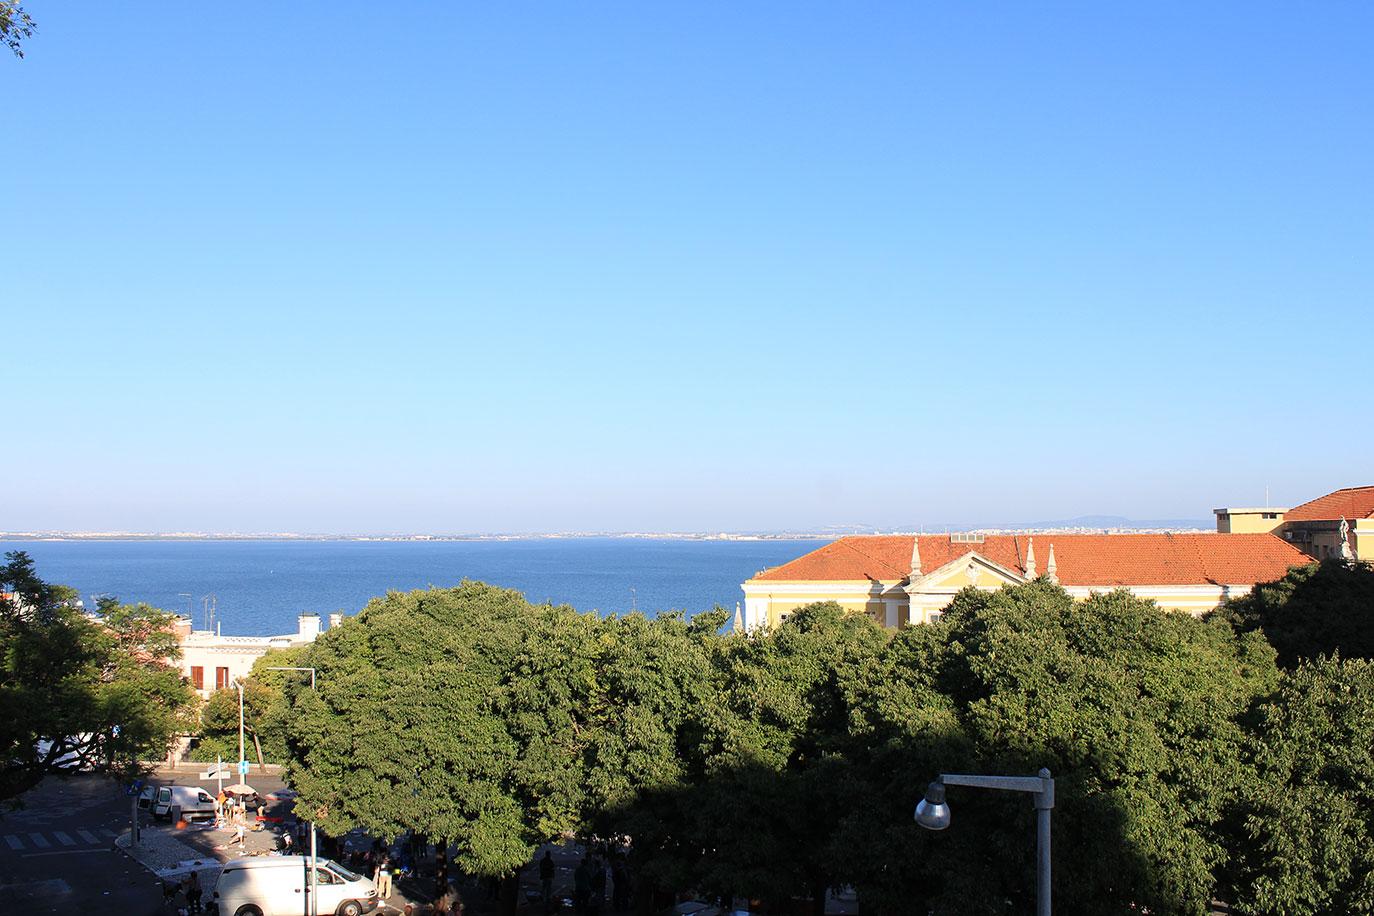 banco de jardim lisboa:Miradouro do Jardim Botto Machado em Lisboa • Portugal